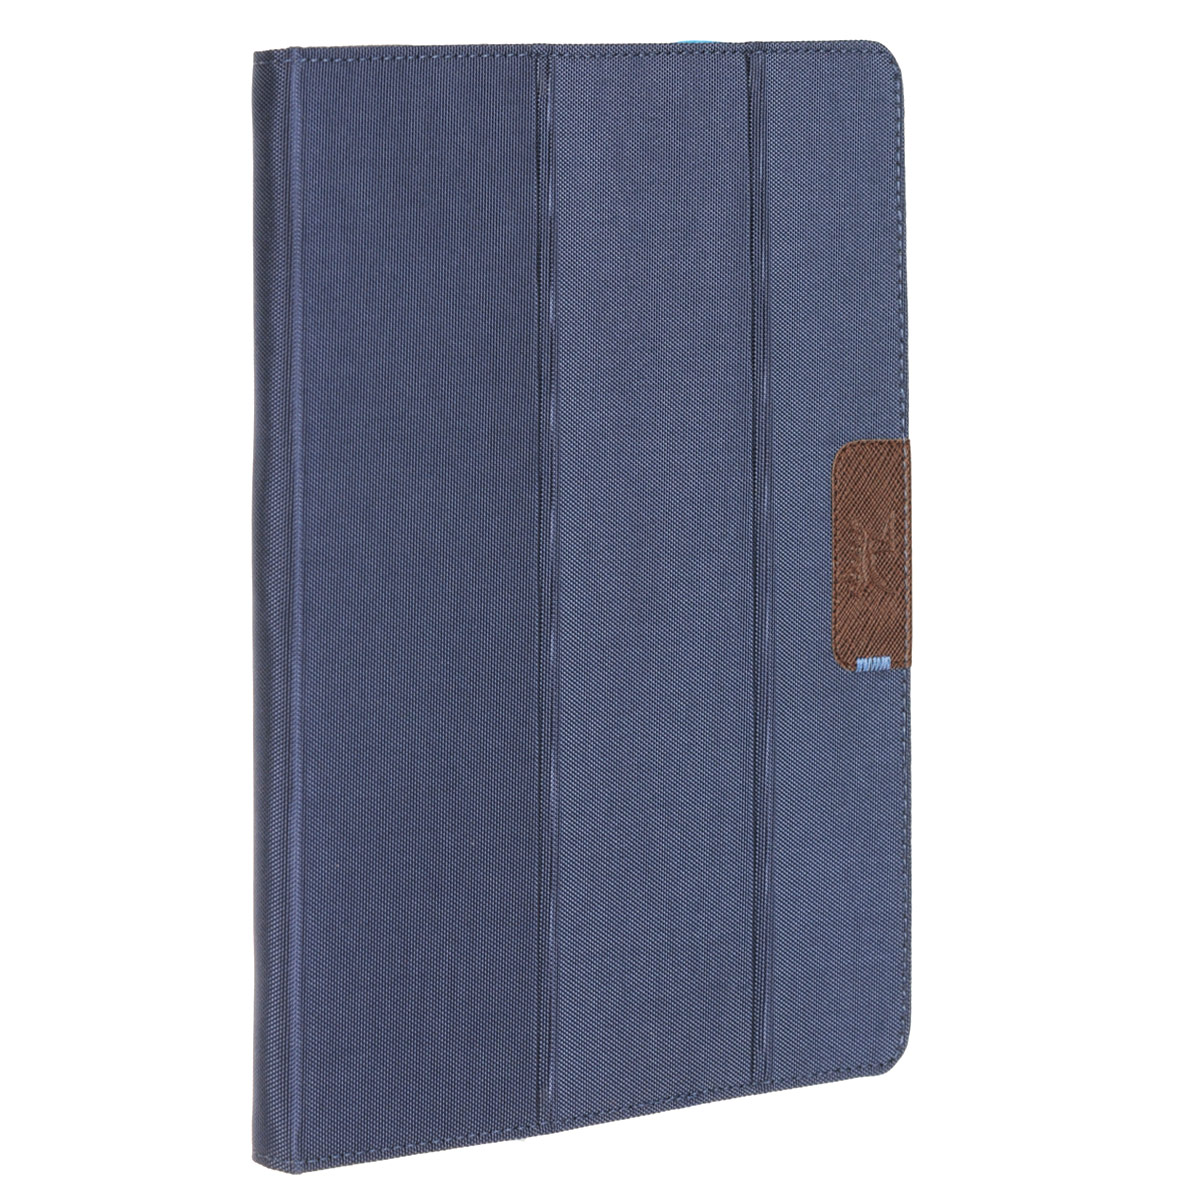 "Snoogy SN-FCU97 чехол для планшетов 9.7"", Blue (ткань)"